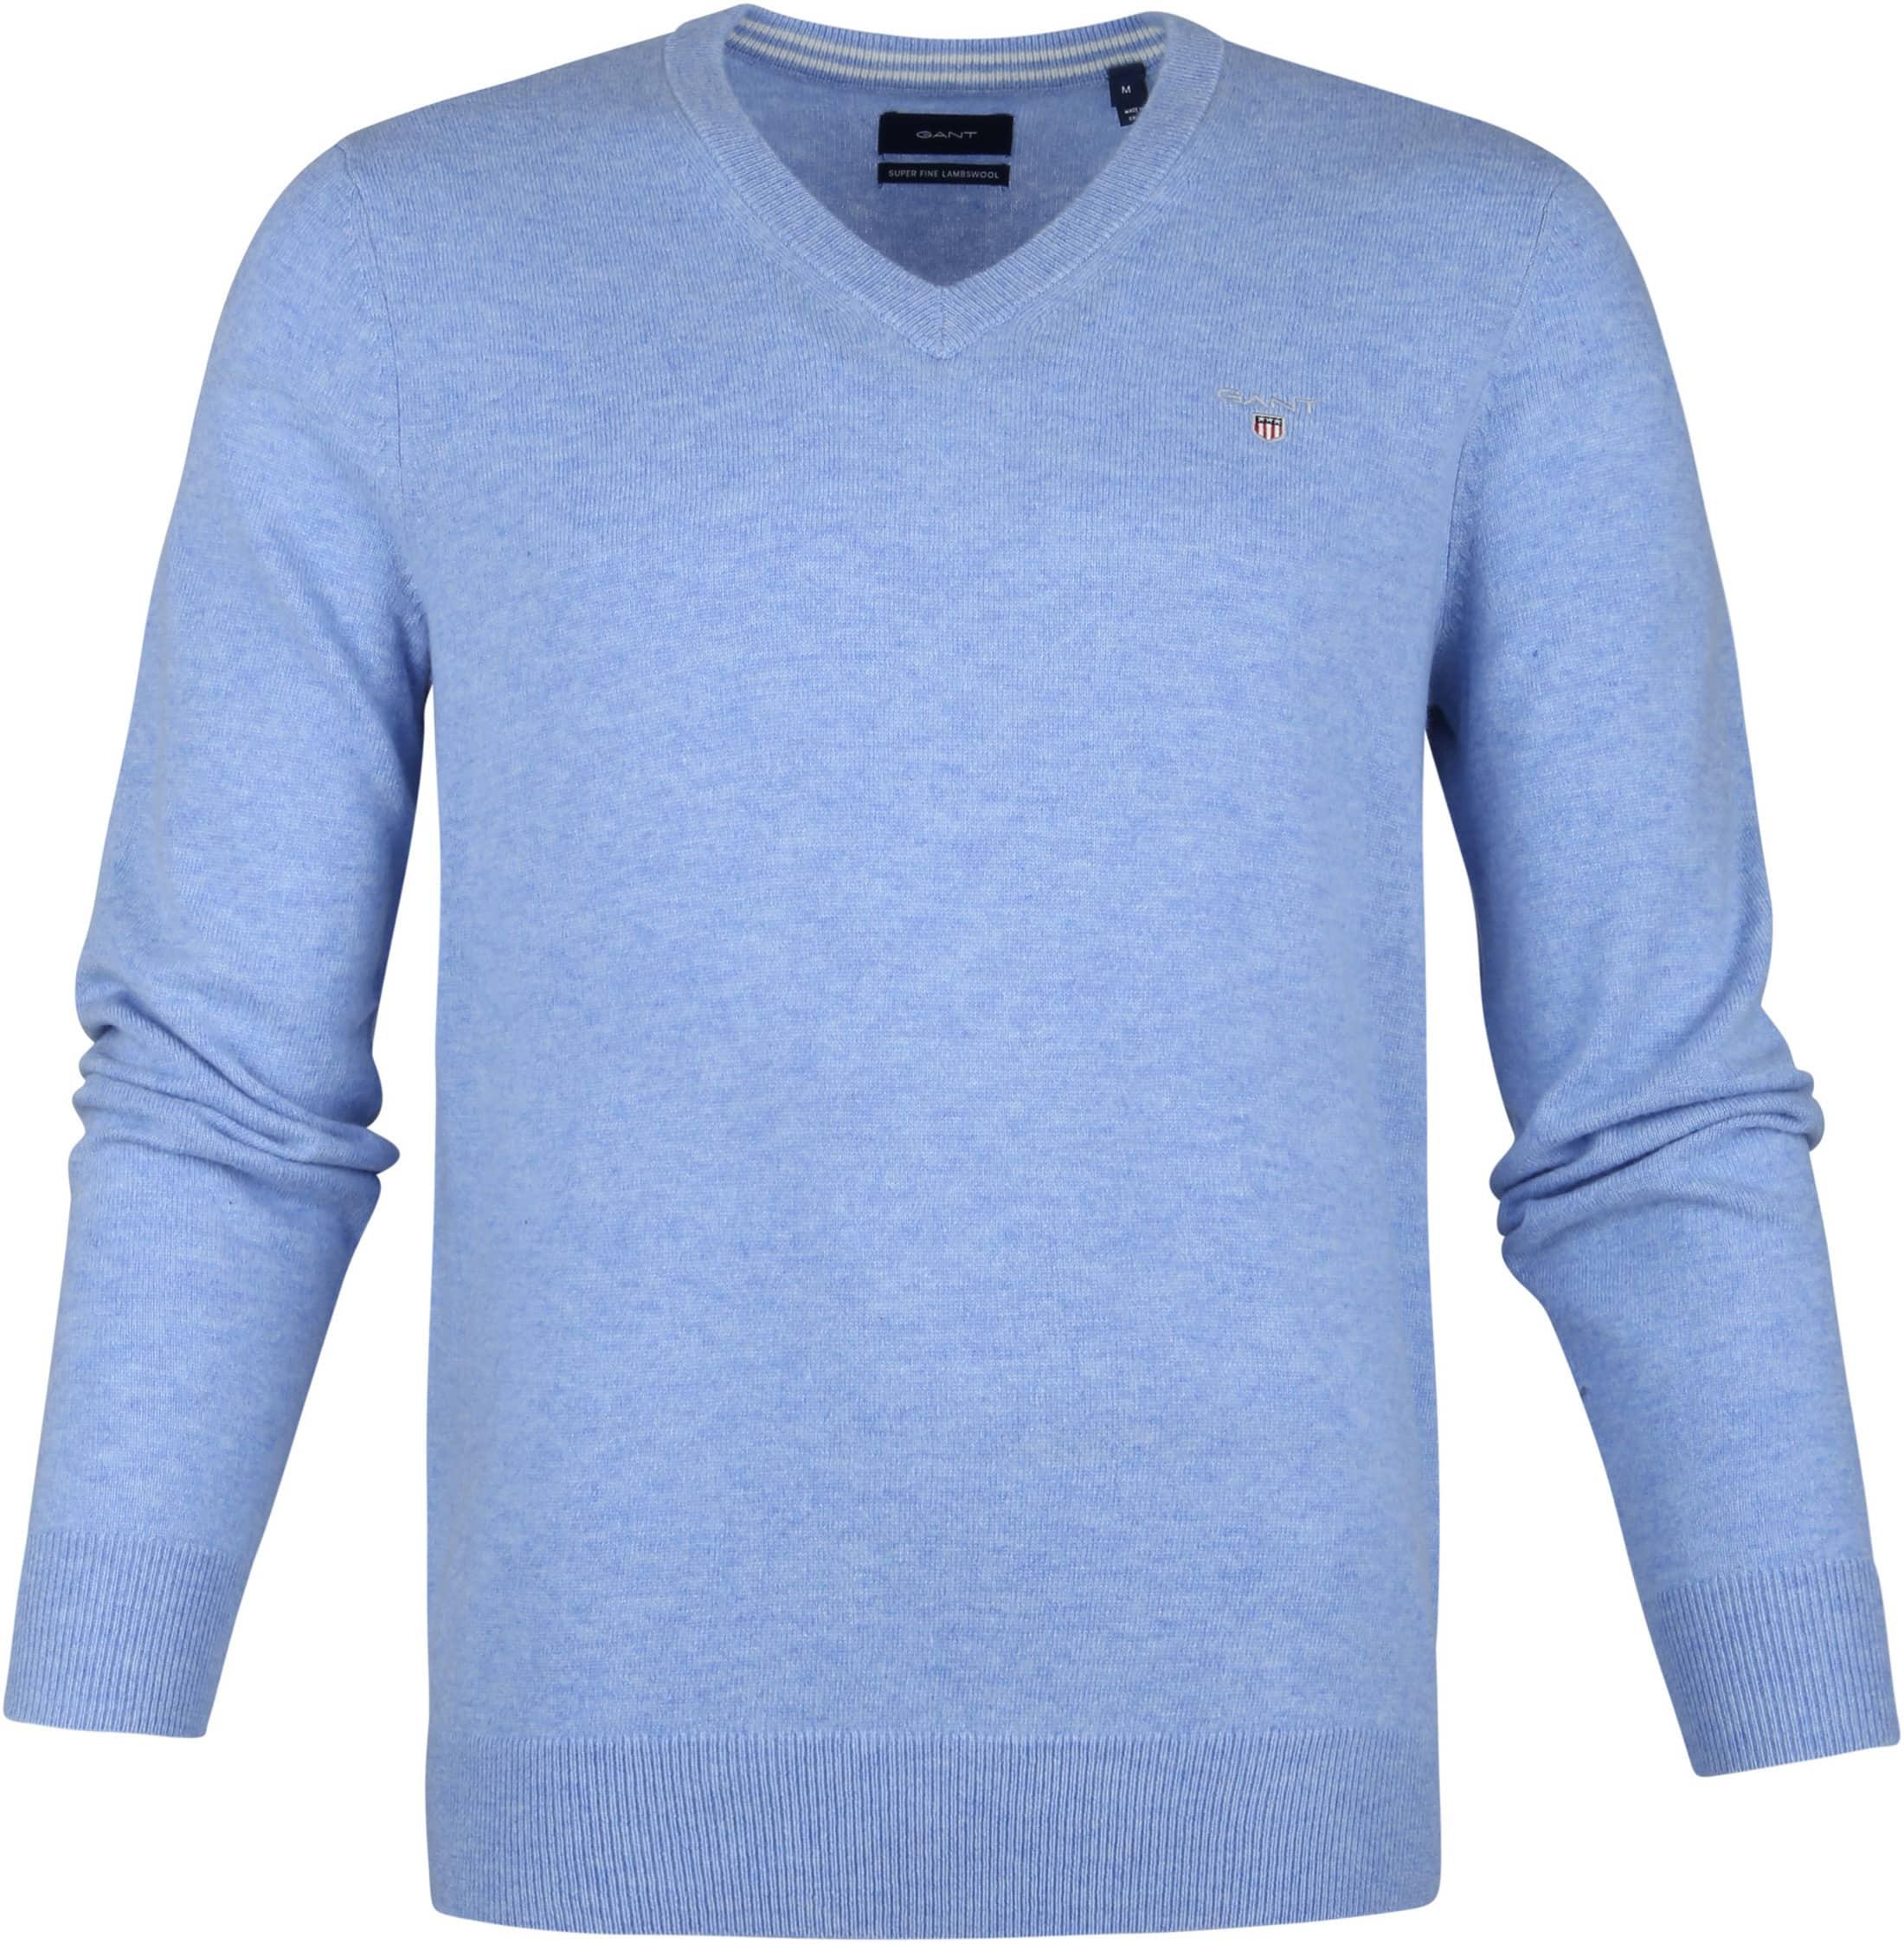 Gant Lambswool Pullover Light Blue photo 0